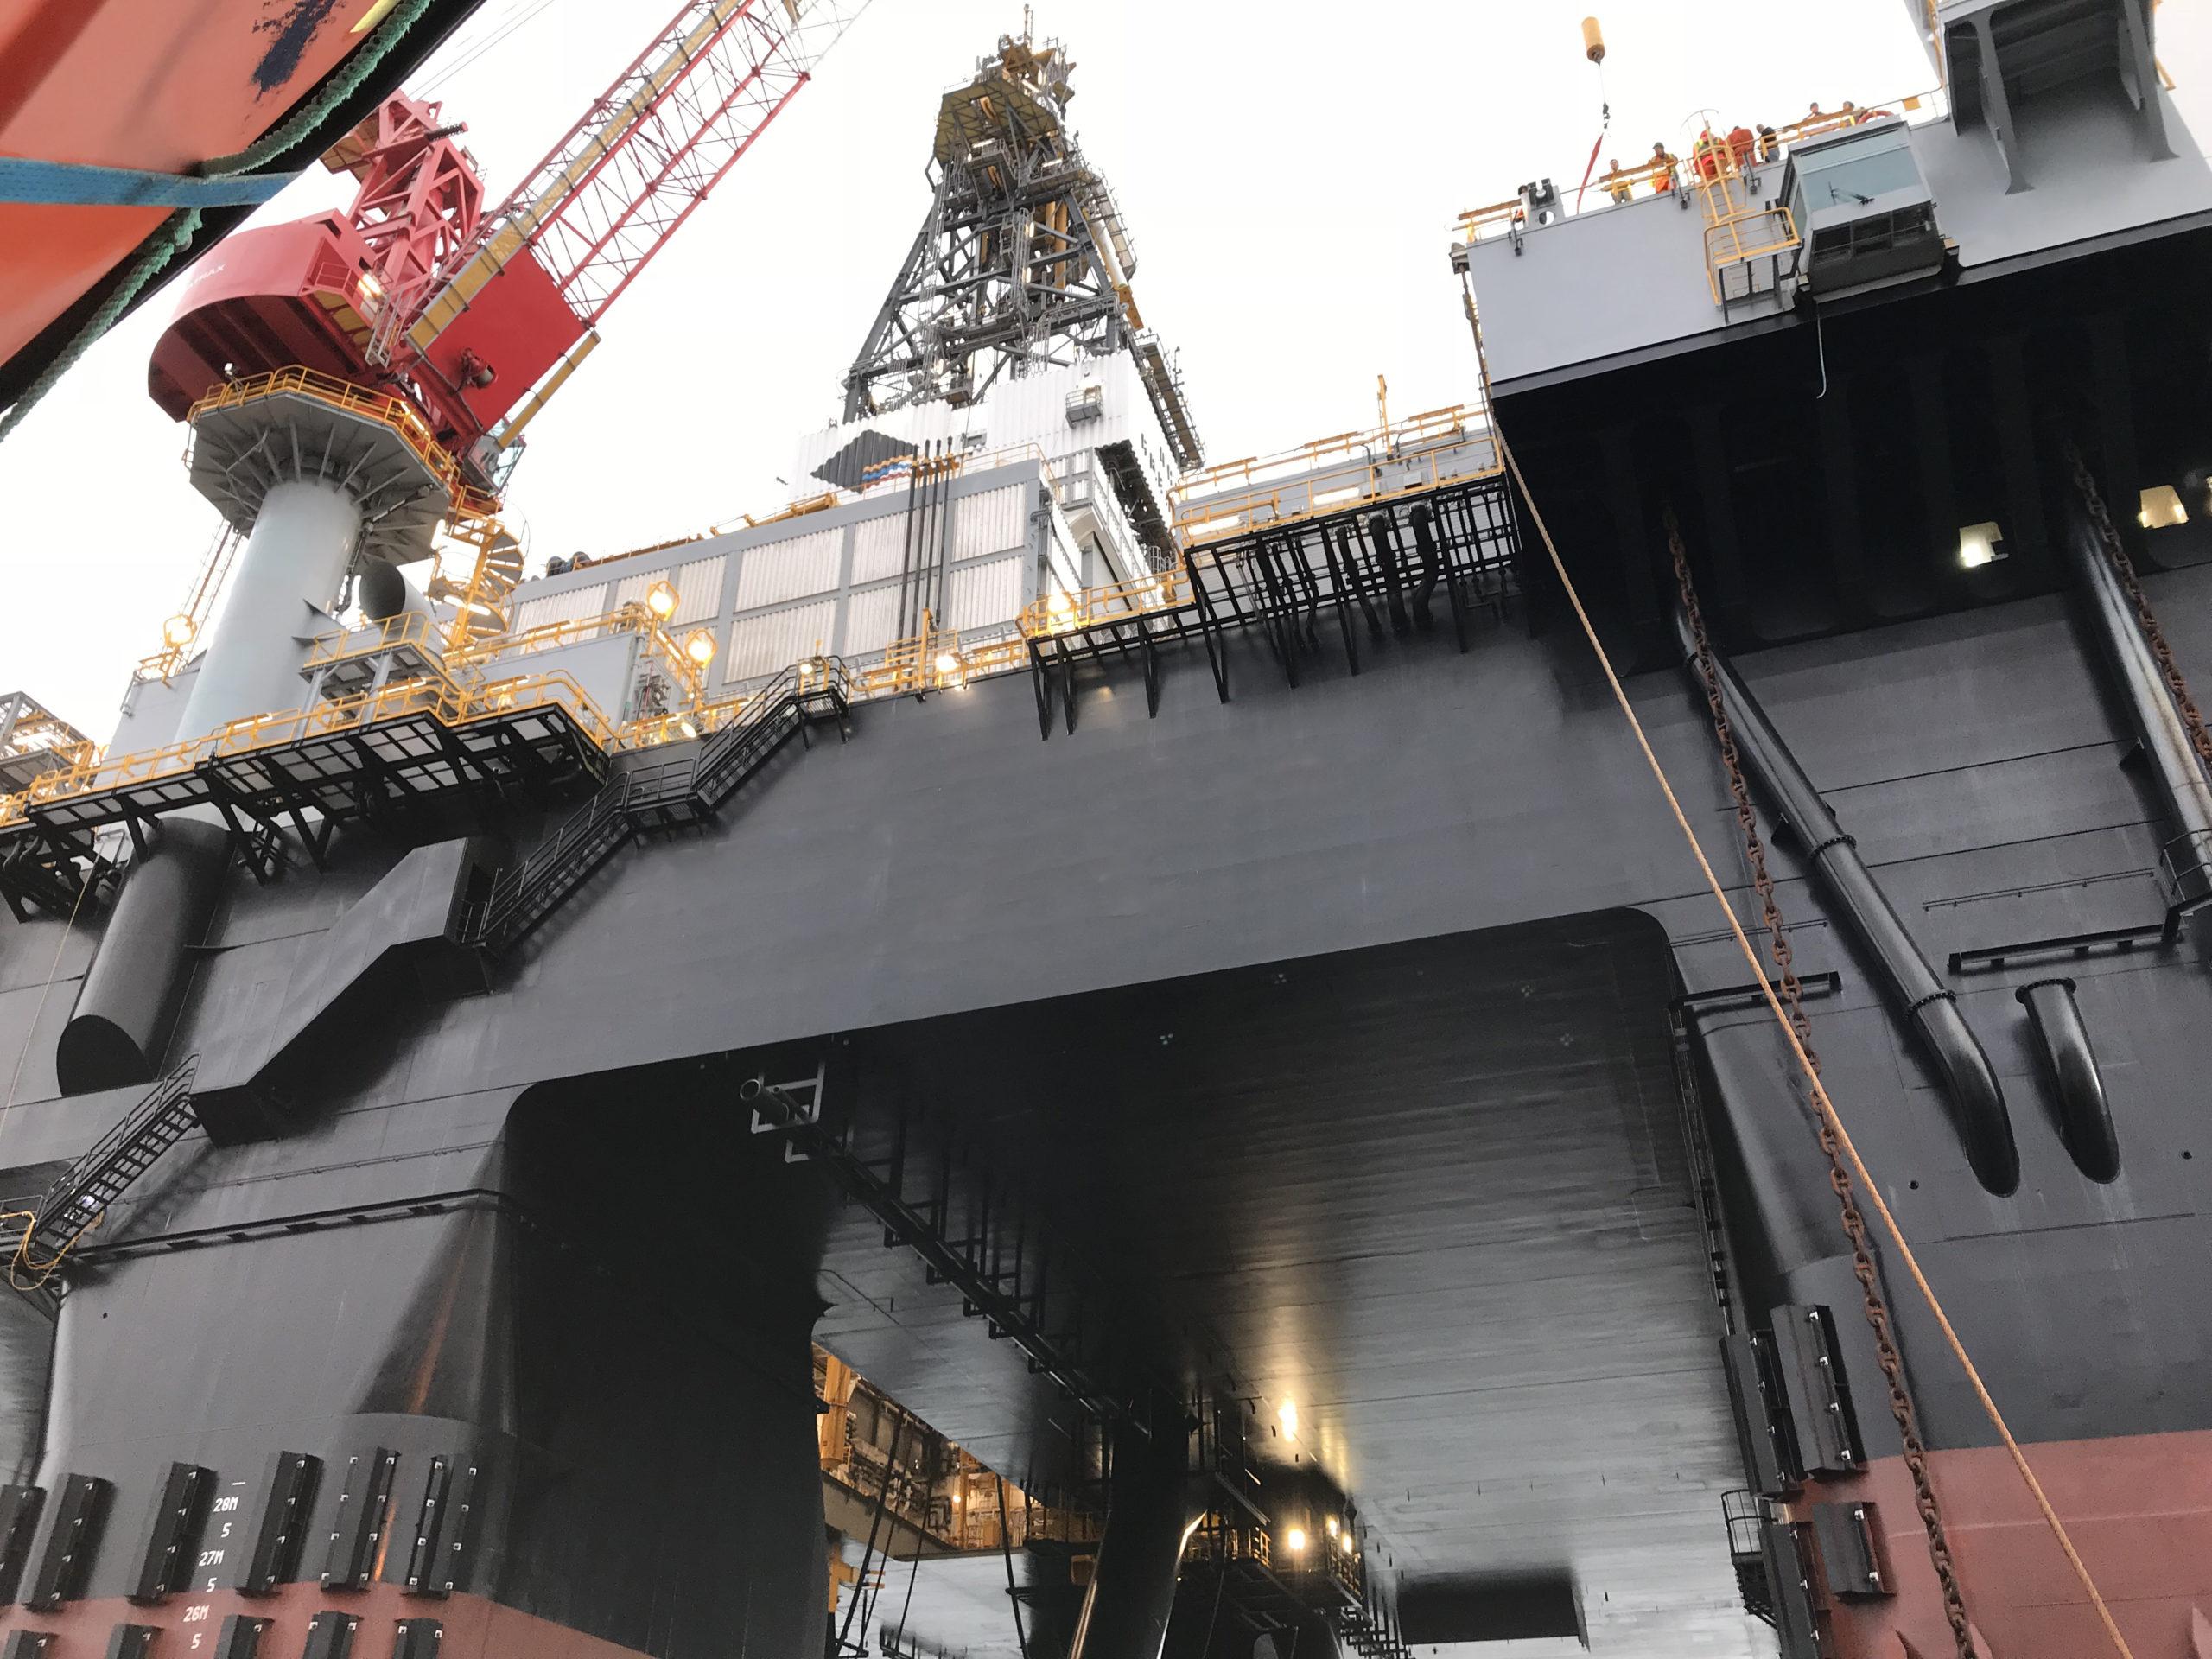 Semi-Sub Oil Rig - SMS Repair